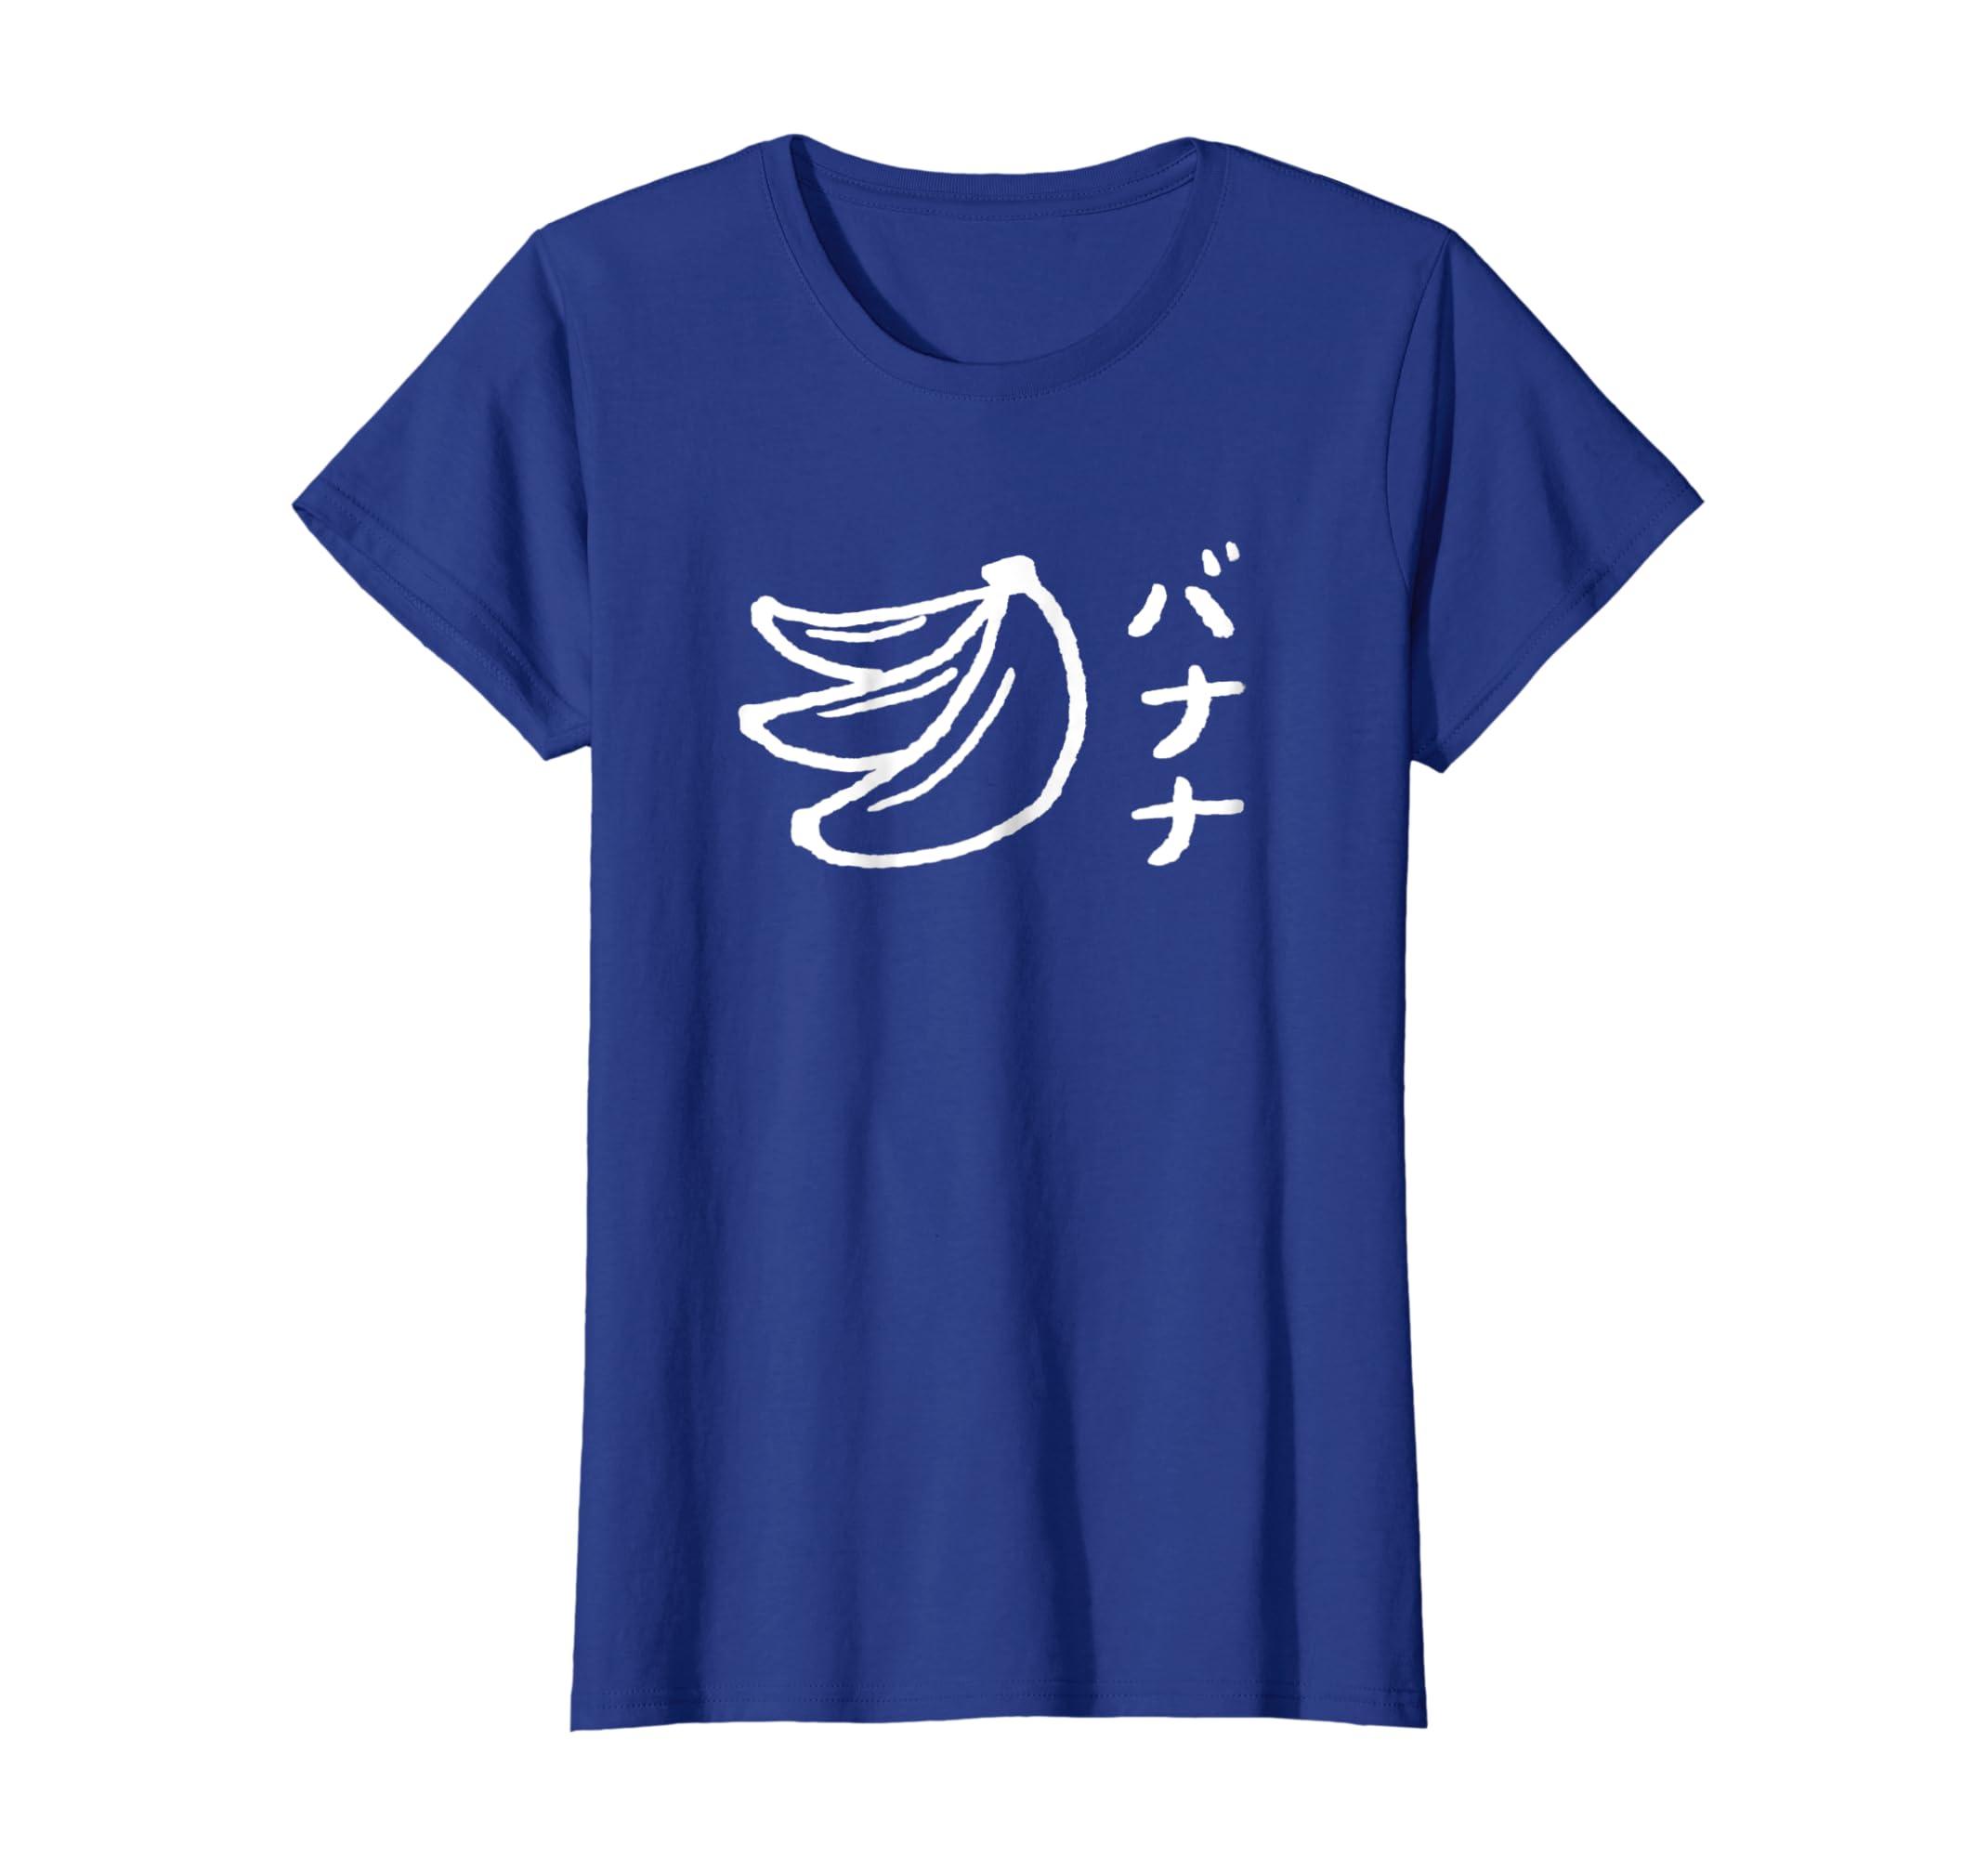 da41ab5b6 Amazon.com: Cute Japanese Katakana Text Banana T-Shirt: Clothing